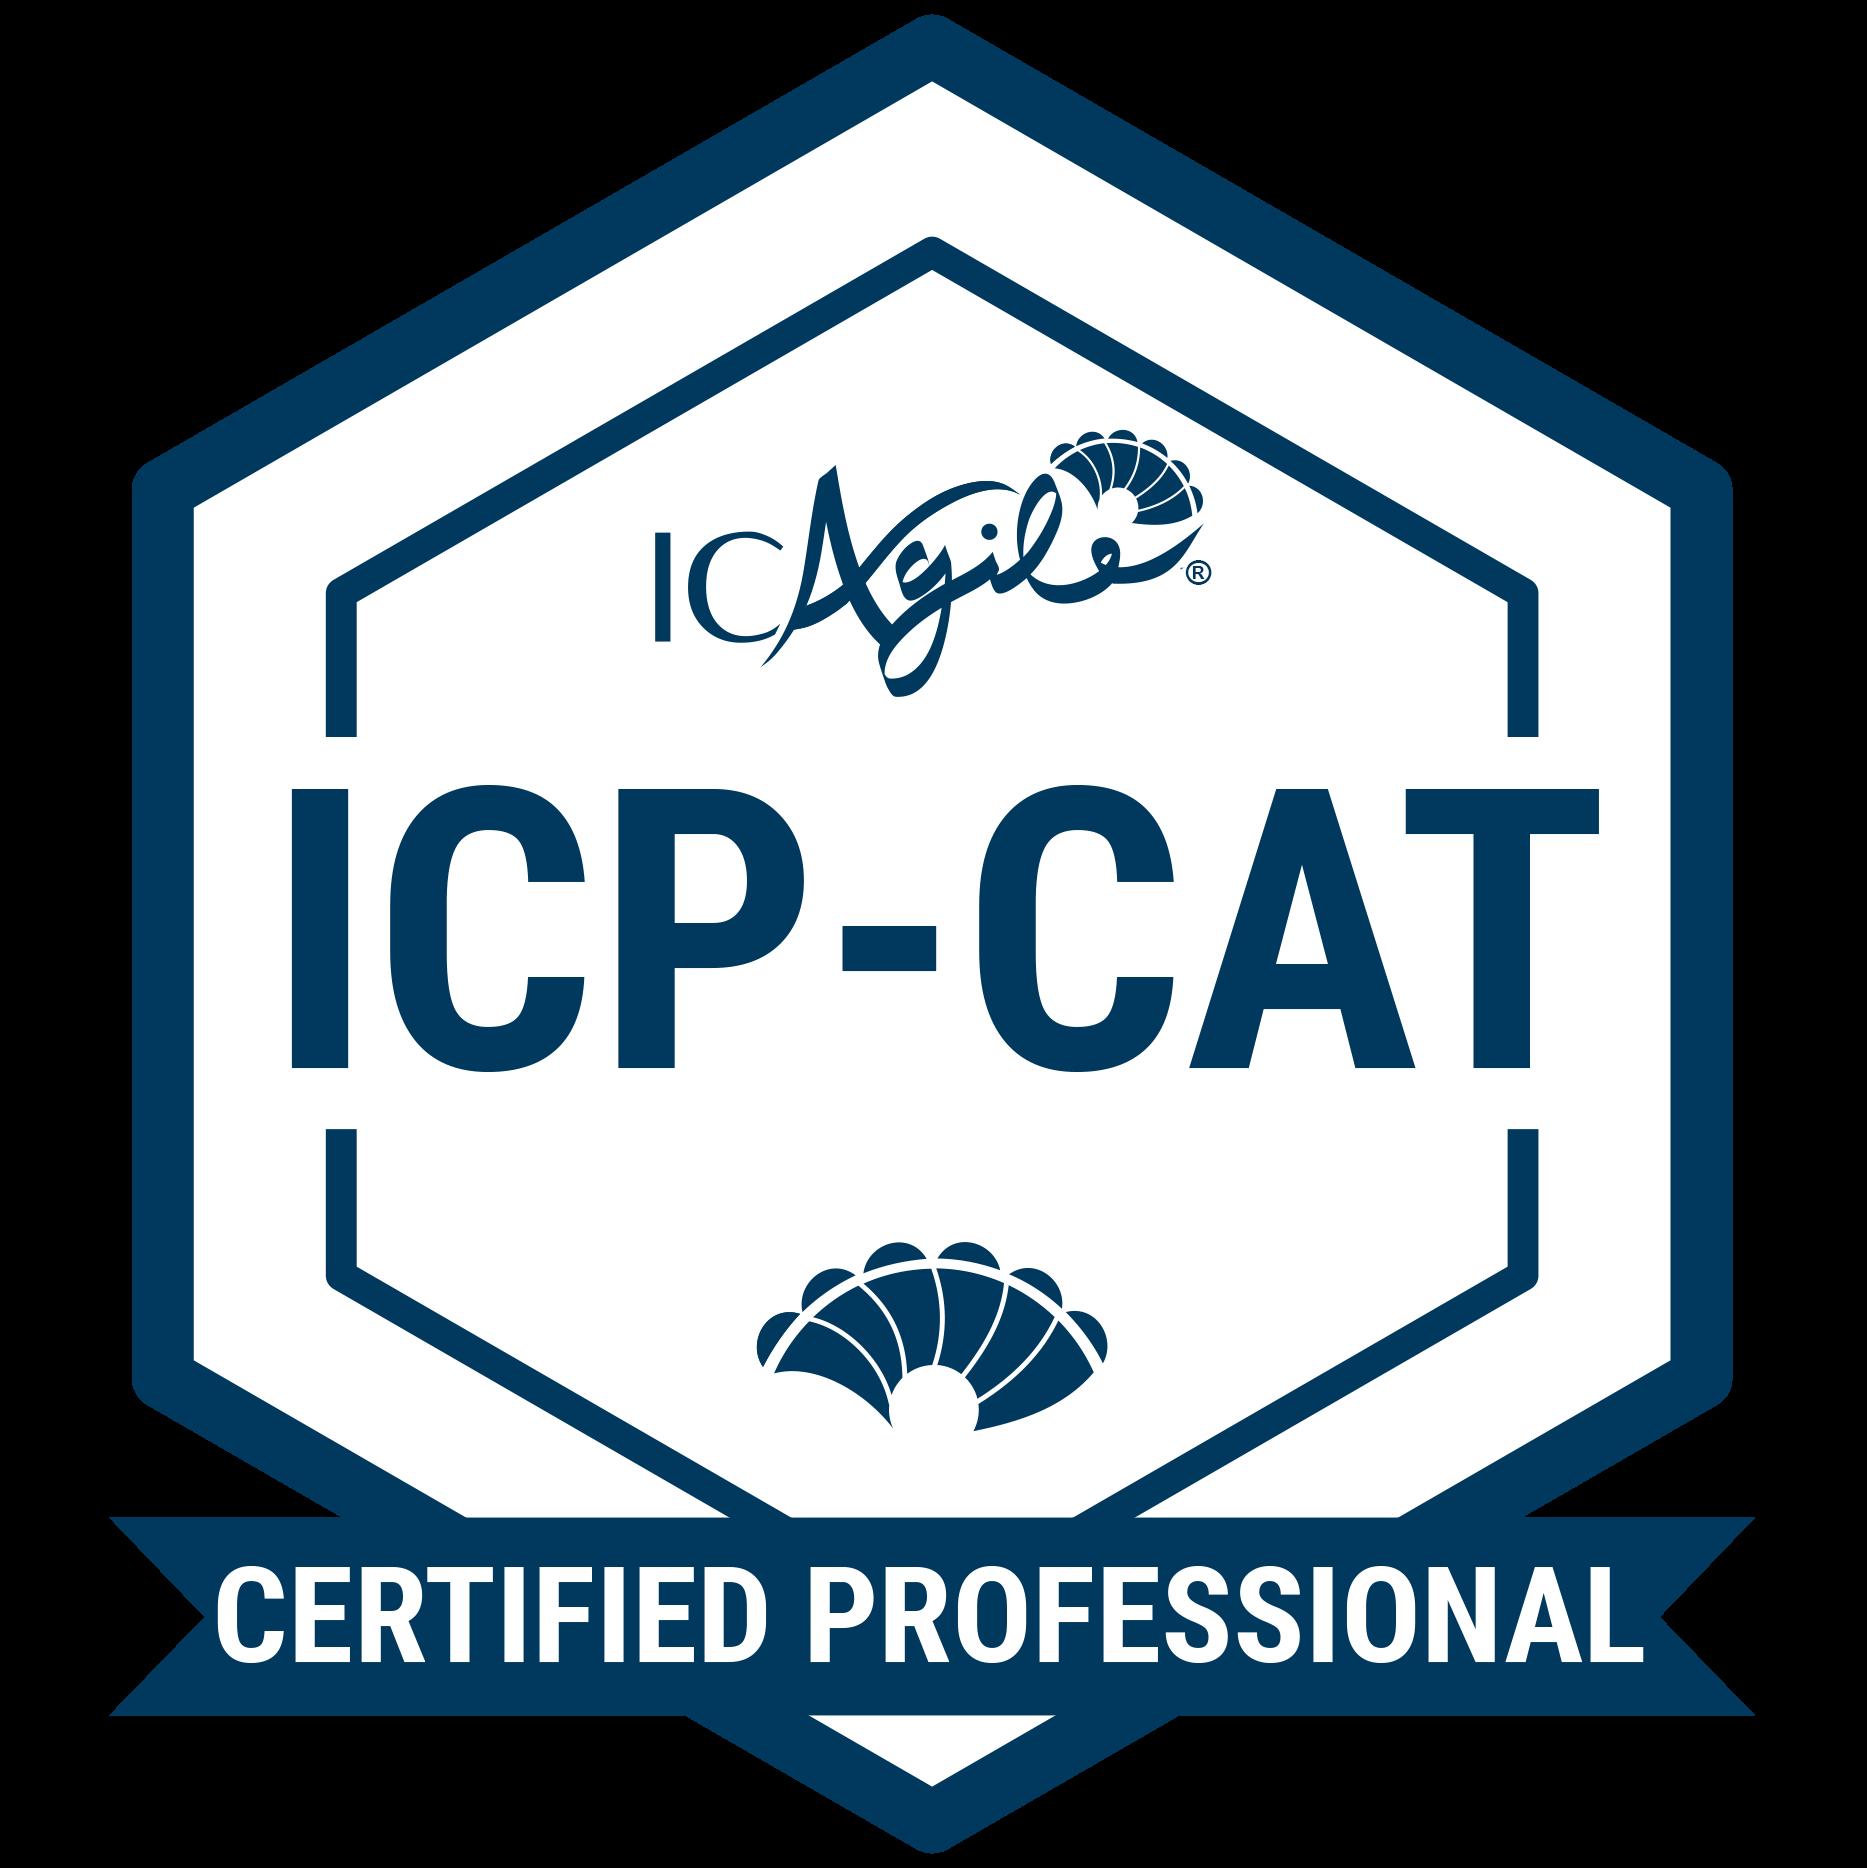 Agile Coaching certifications